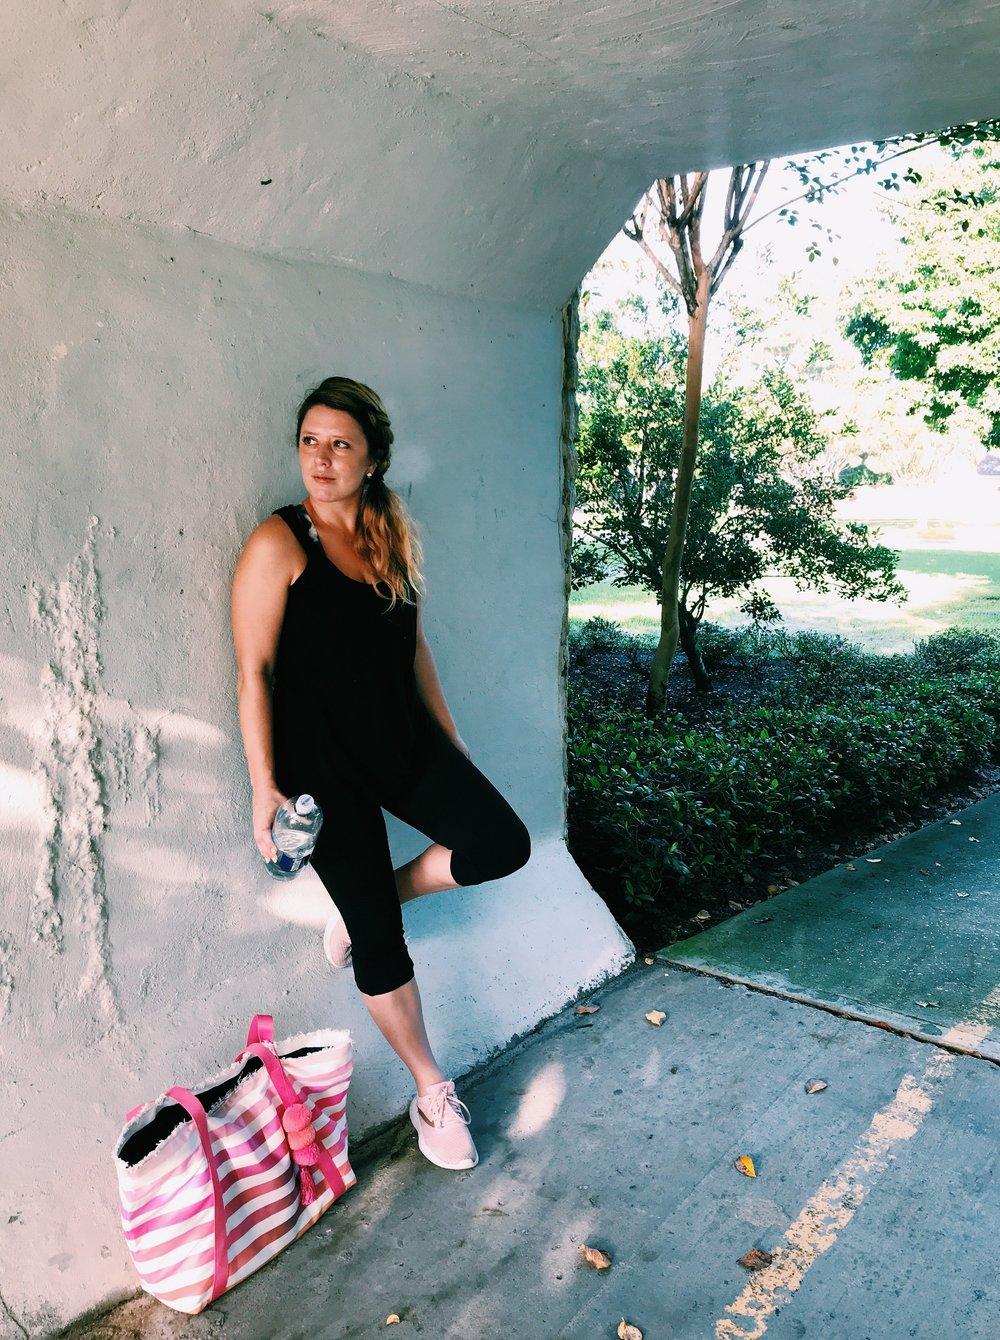 Three Heel Clicks - One Month of BBG (1).jpg